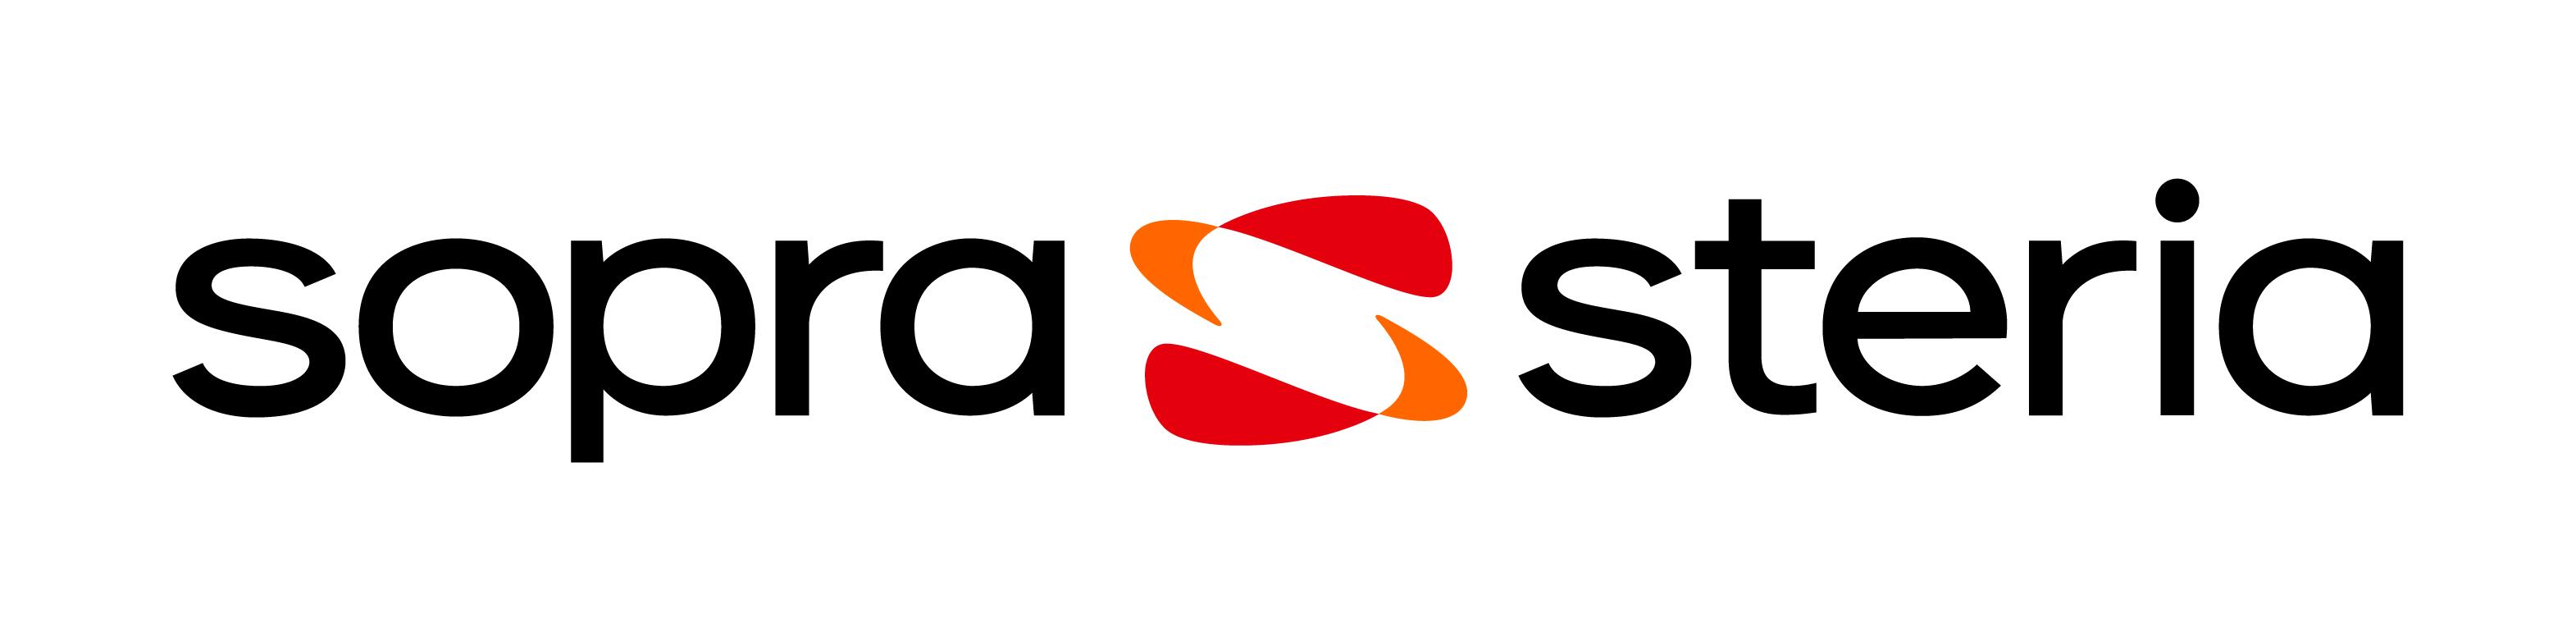 SOPRASTERIA_logo_CMJN_exe